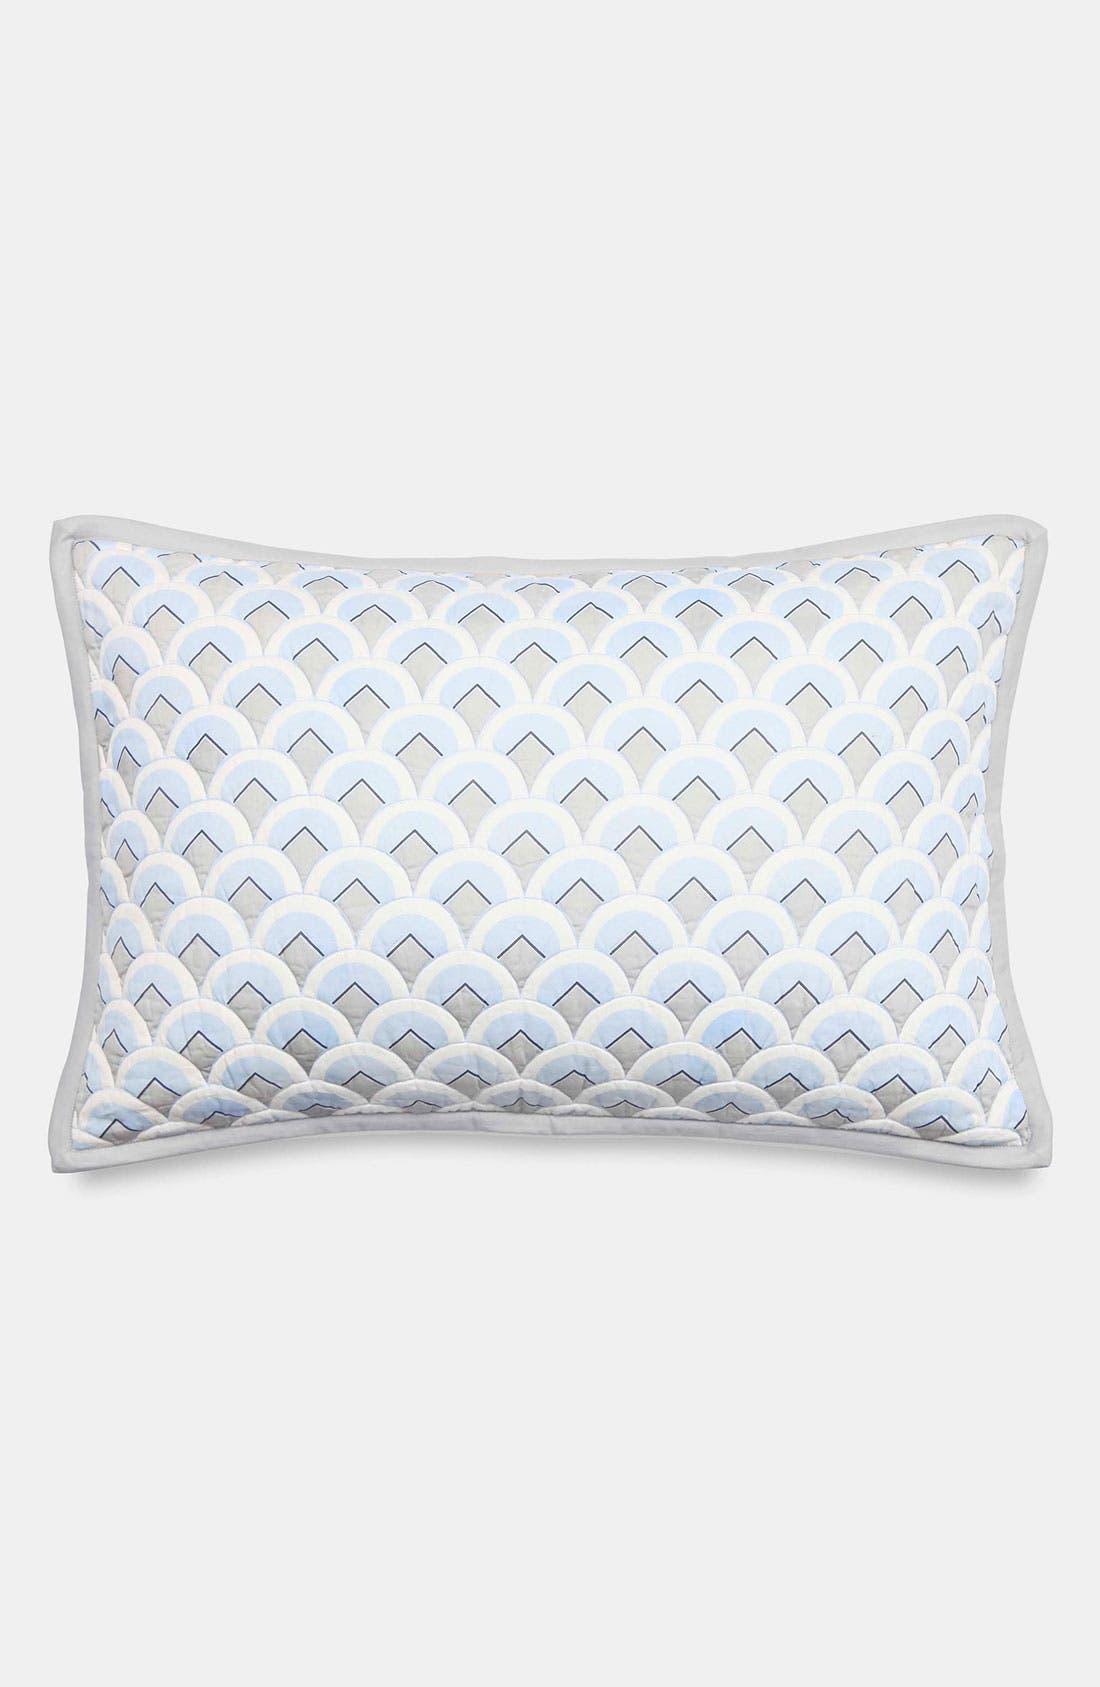 Main Image - kate spade new york 'deco geo' 400 thread count pillow sham